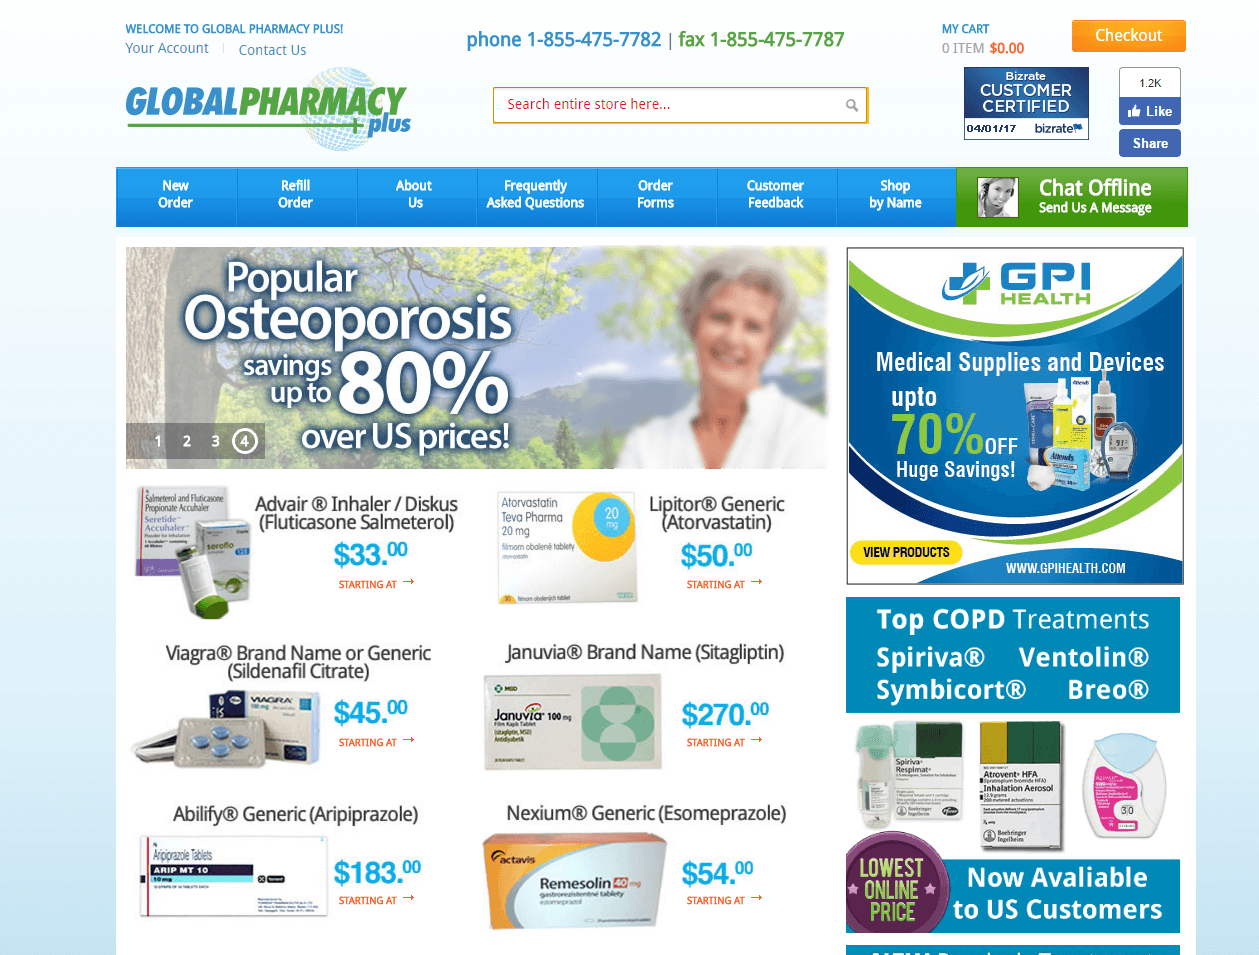 Globalpharmacyplus.com Main Page